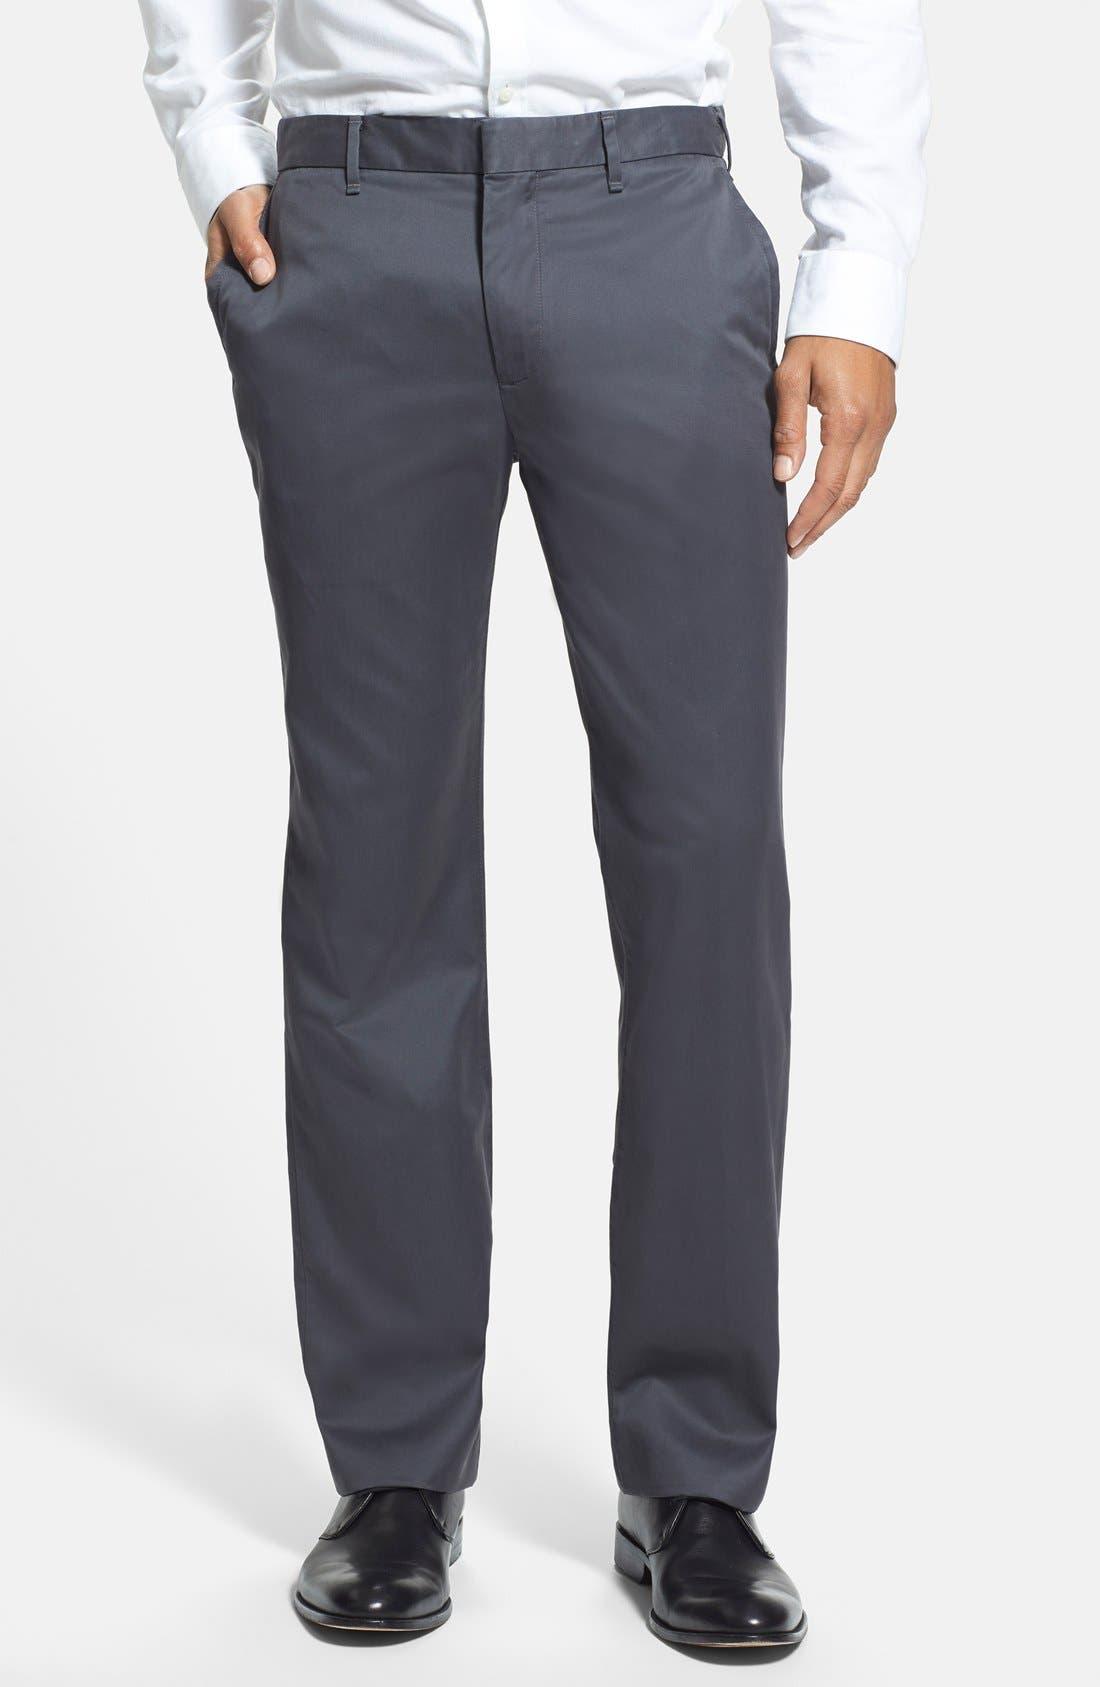 'Weekday Warriors' Non-Iron Straight Leg Cotton Pants,                         Main,                         color, Friday Greys